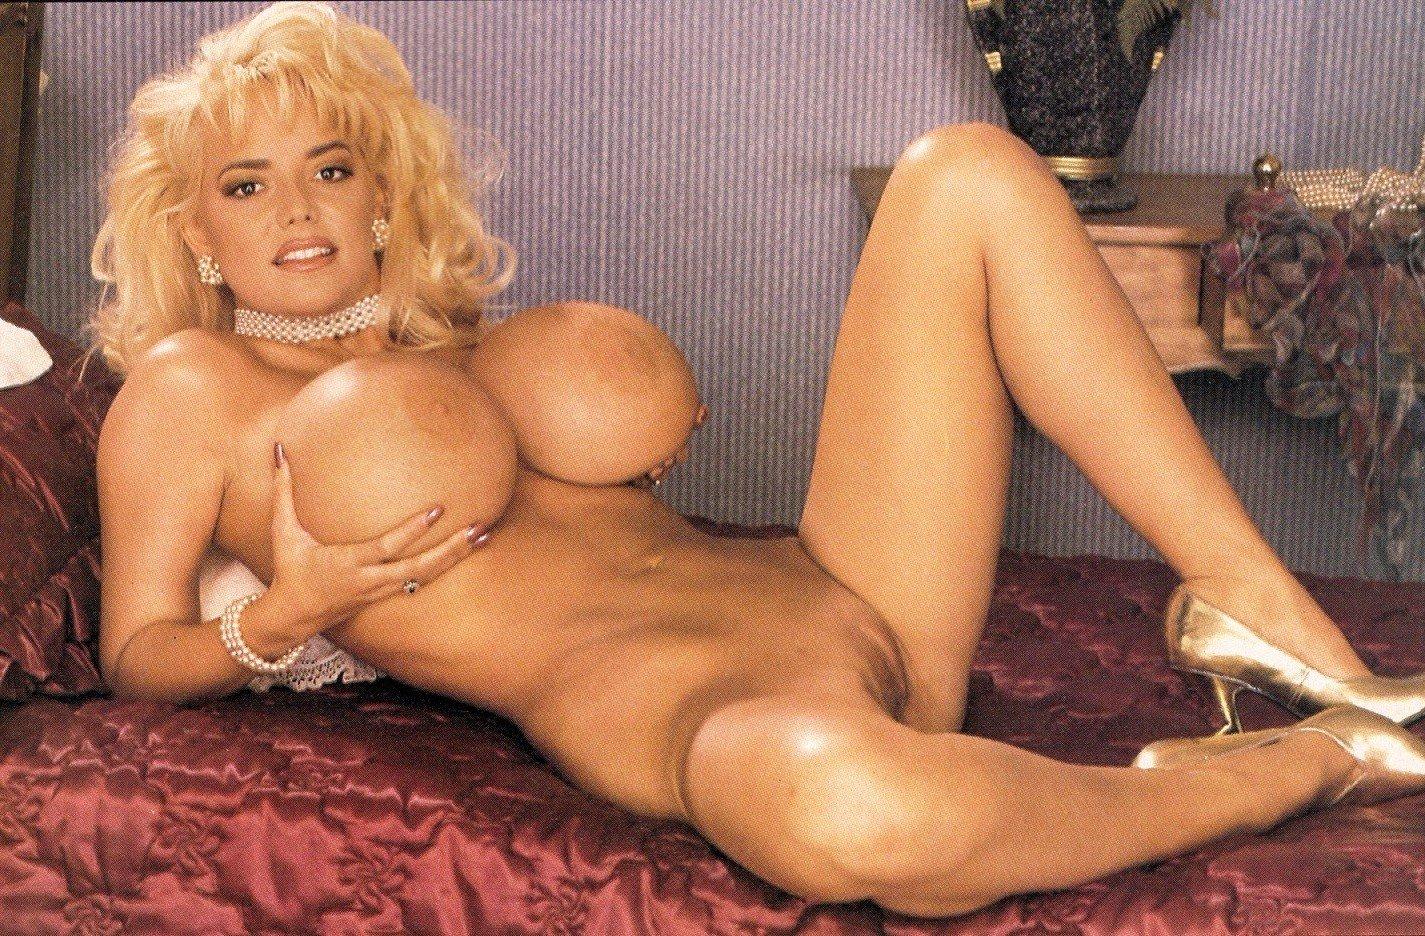 Traci topps nude